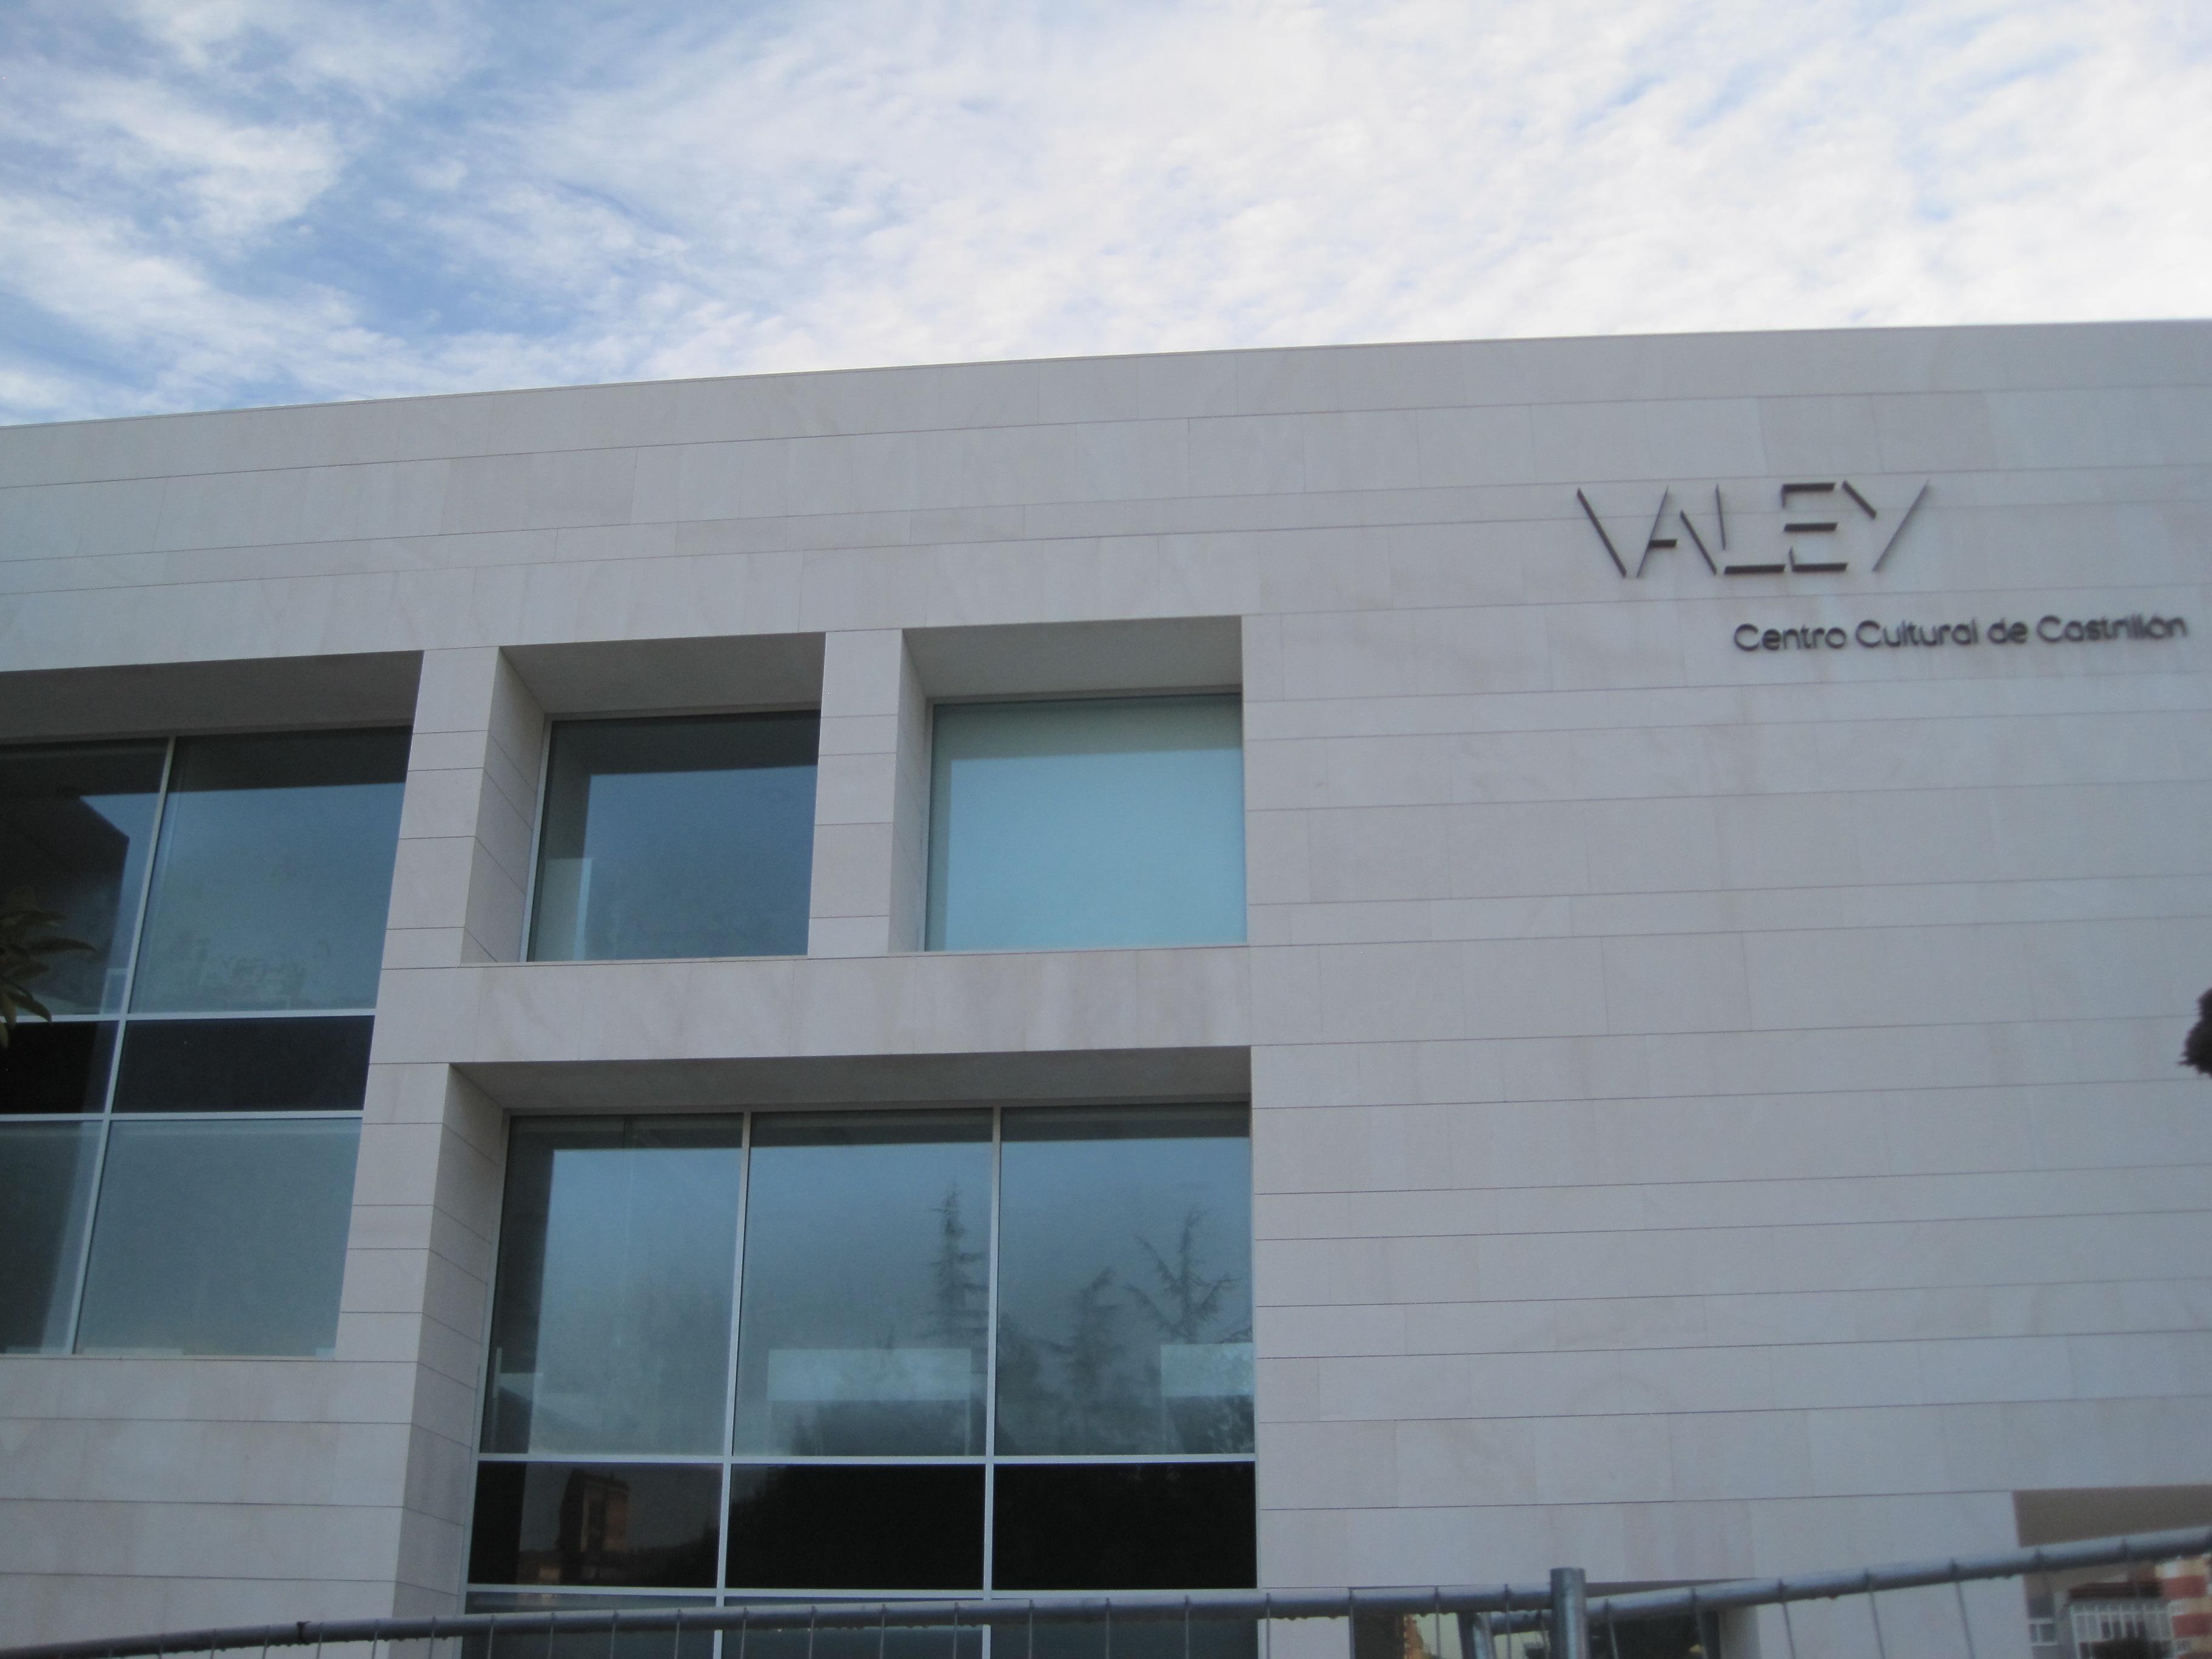 Conferencia: Valey, un Centro Cultural para Castrillón